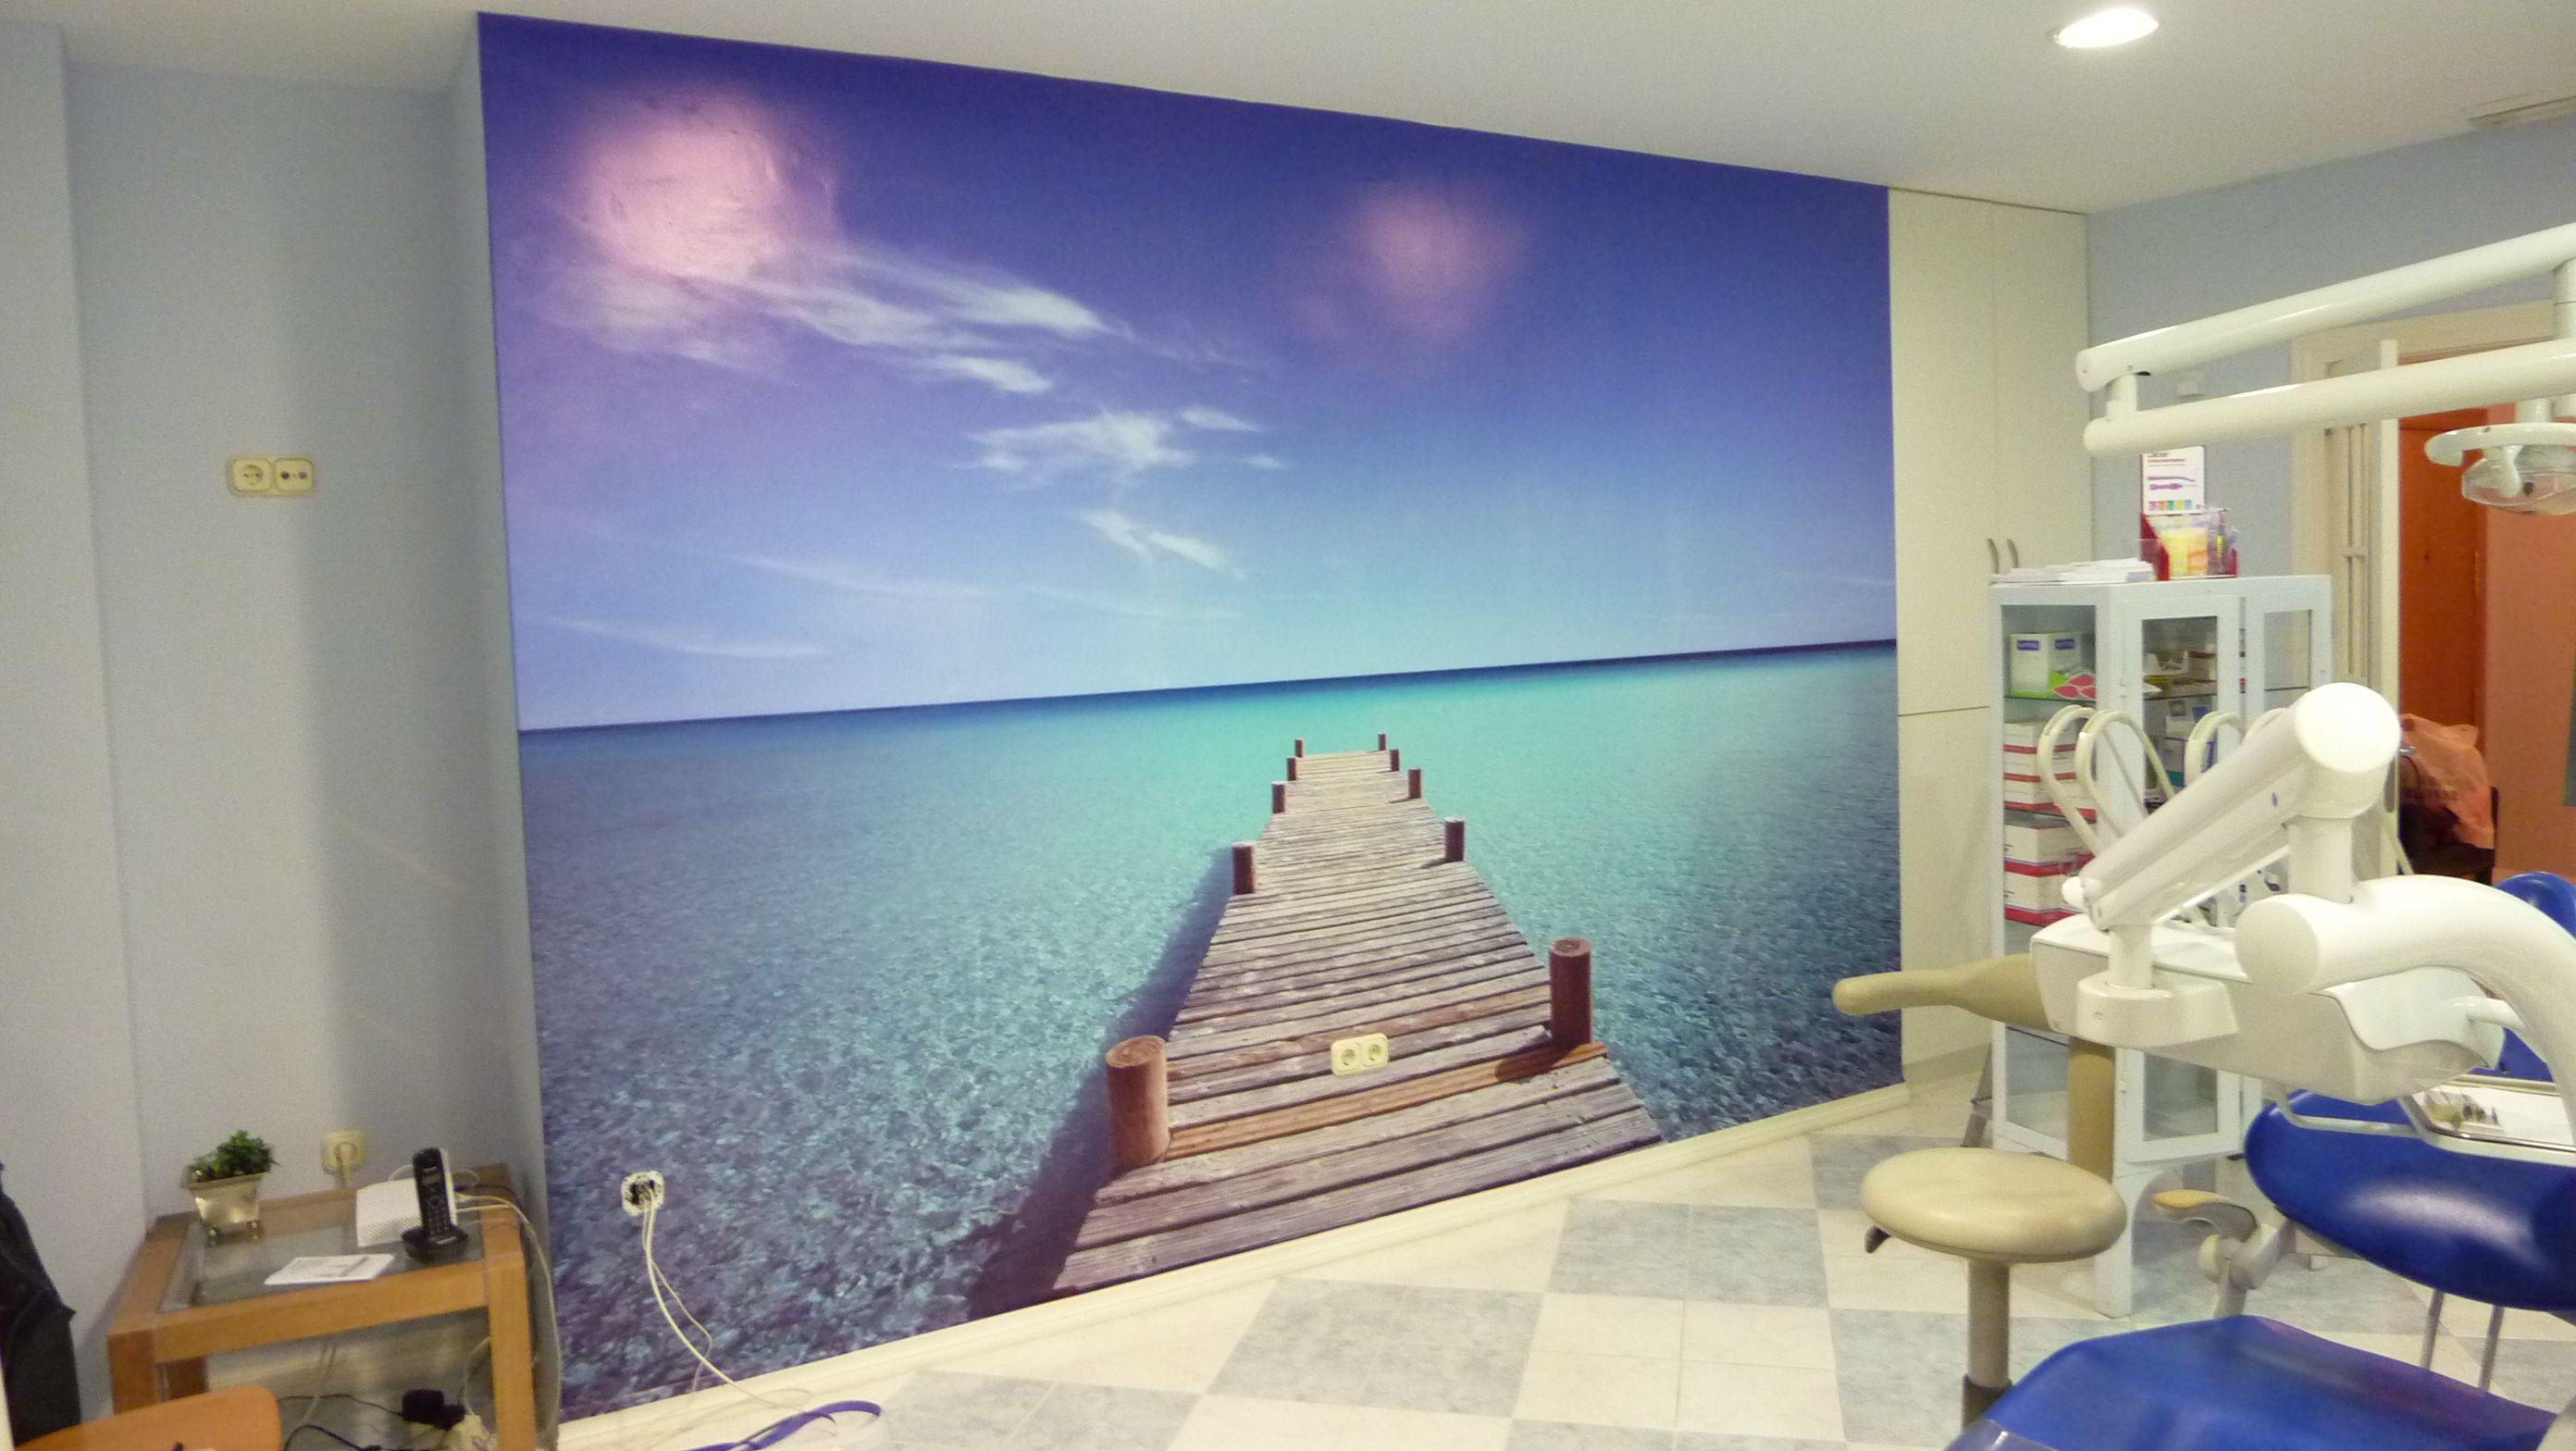 Mural fotogr fico realizado en vinilo para clinica dental - Decoracion clinica dental ...